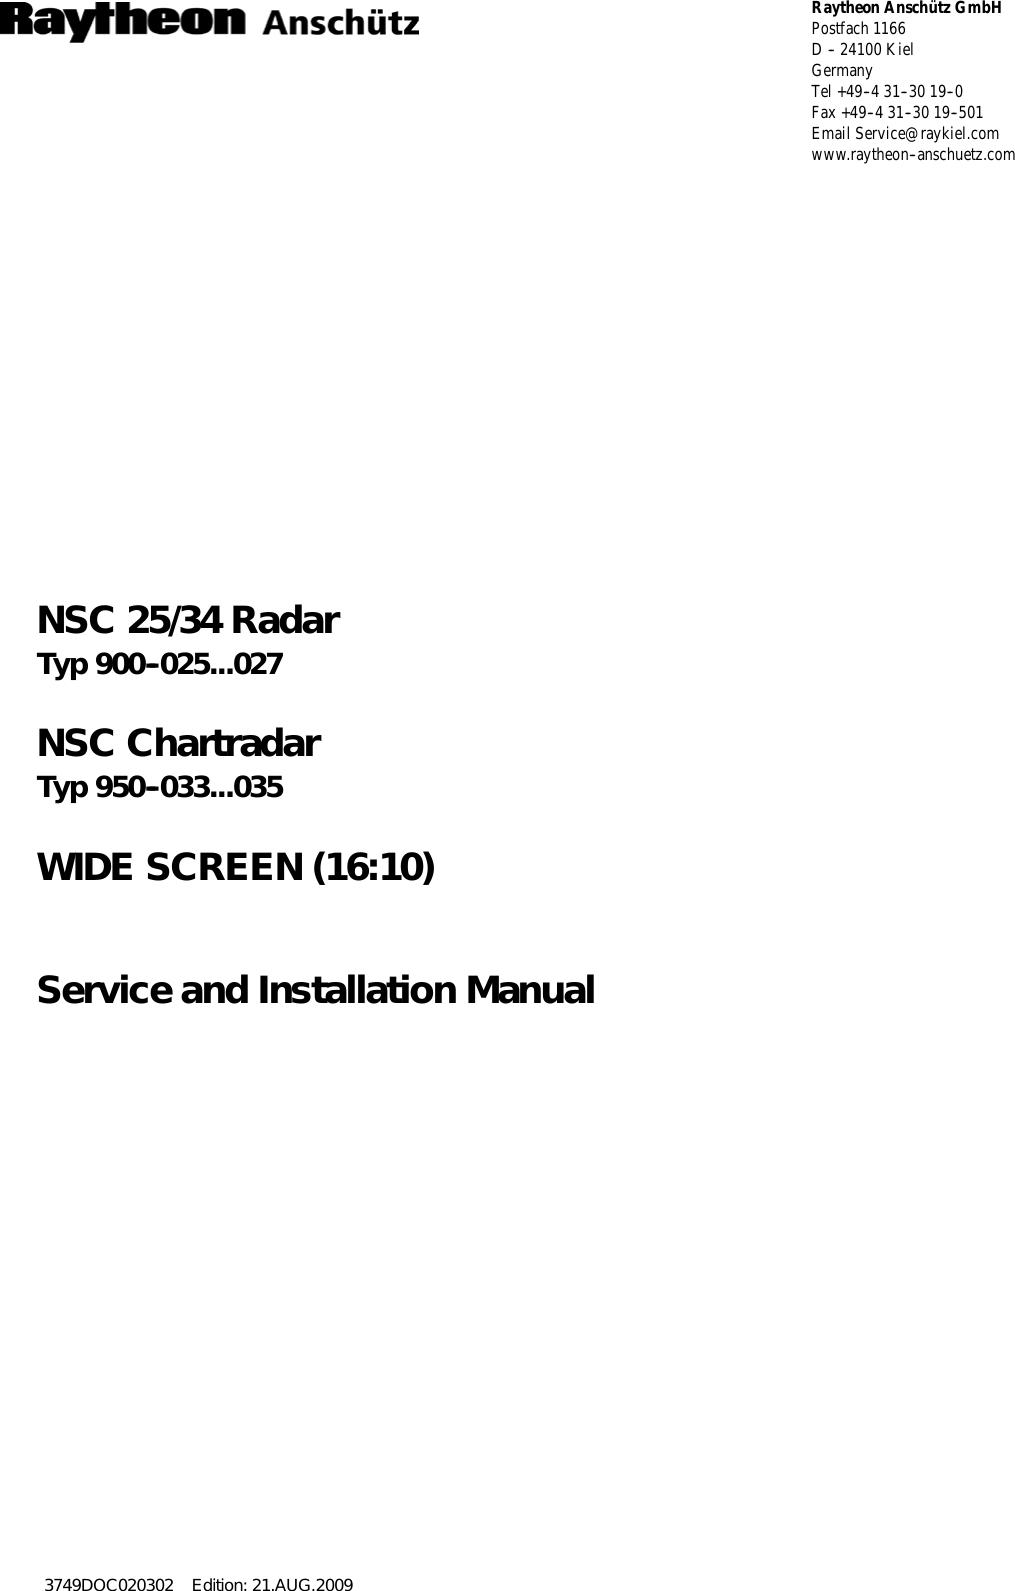 raytheon anschuetz high seas 9ran sur 25u marine radar user manual titel rh usermanual wiki Manuals in PDF sears user manuals online